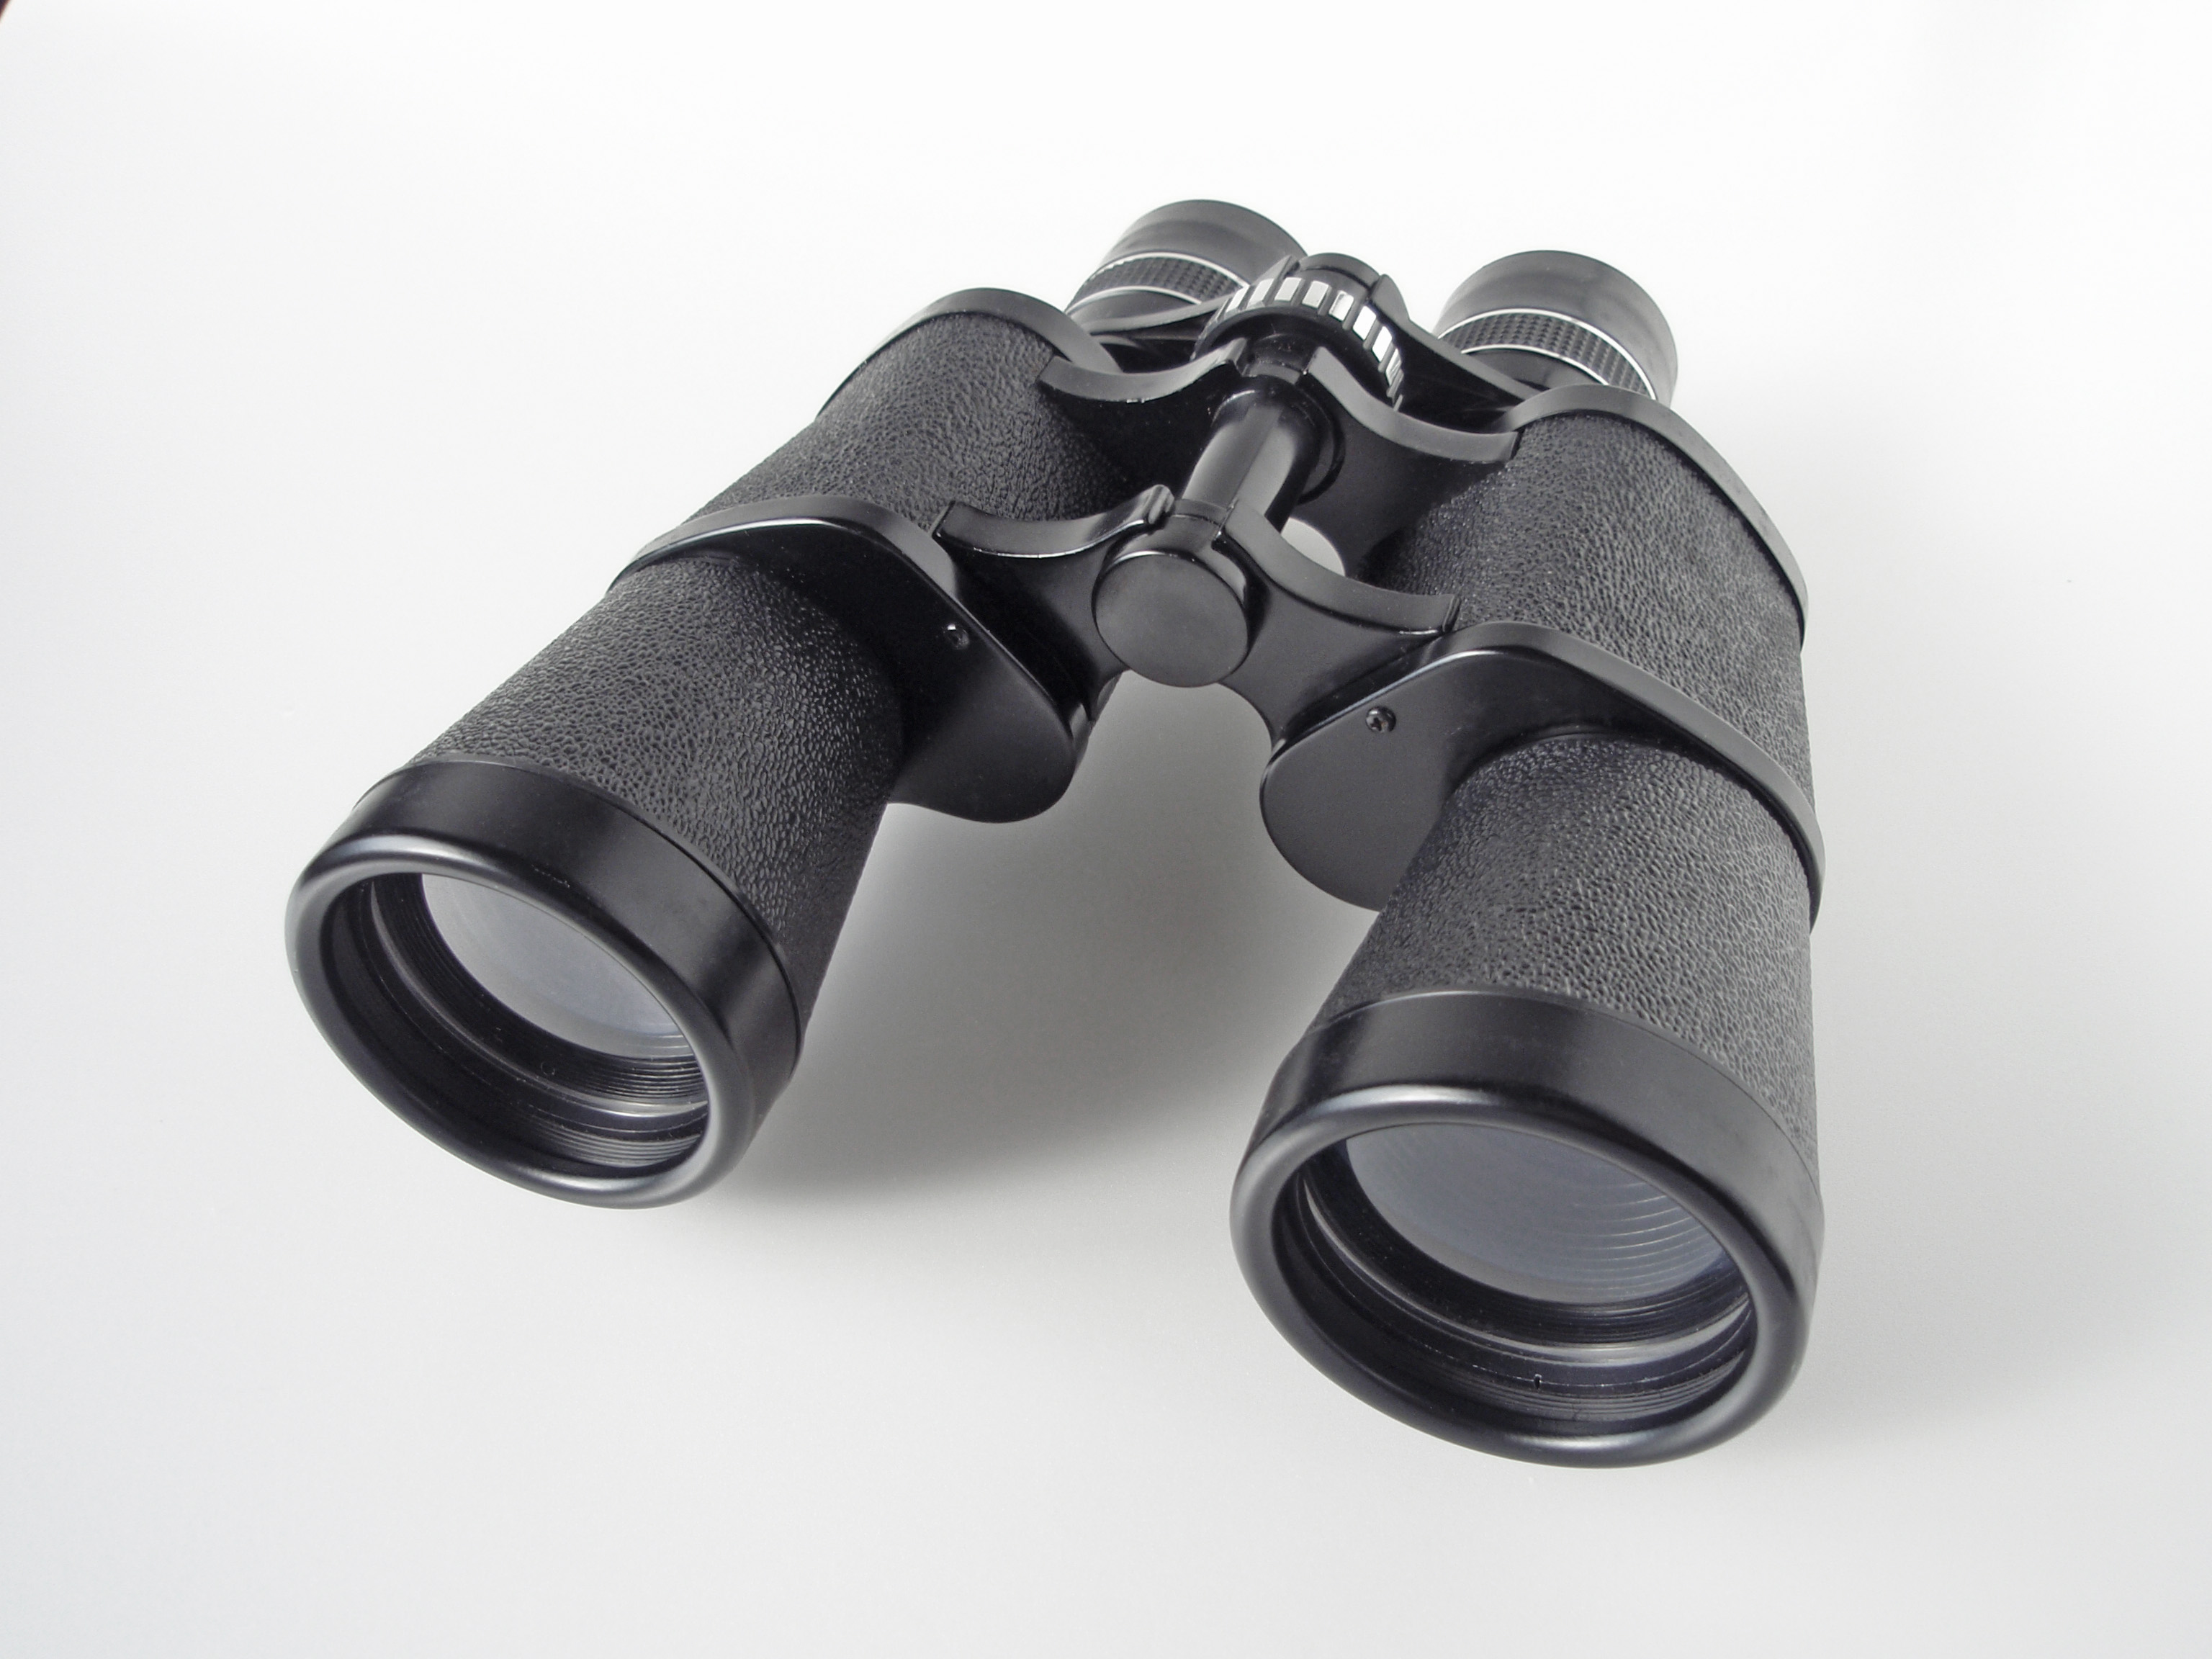 File:Binocular 20101111.jpg - Wikimedia Commons